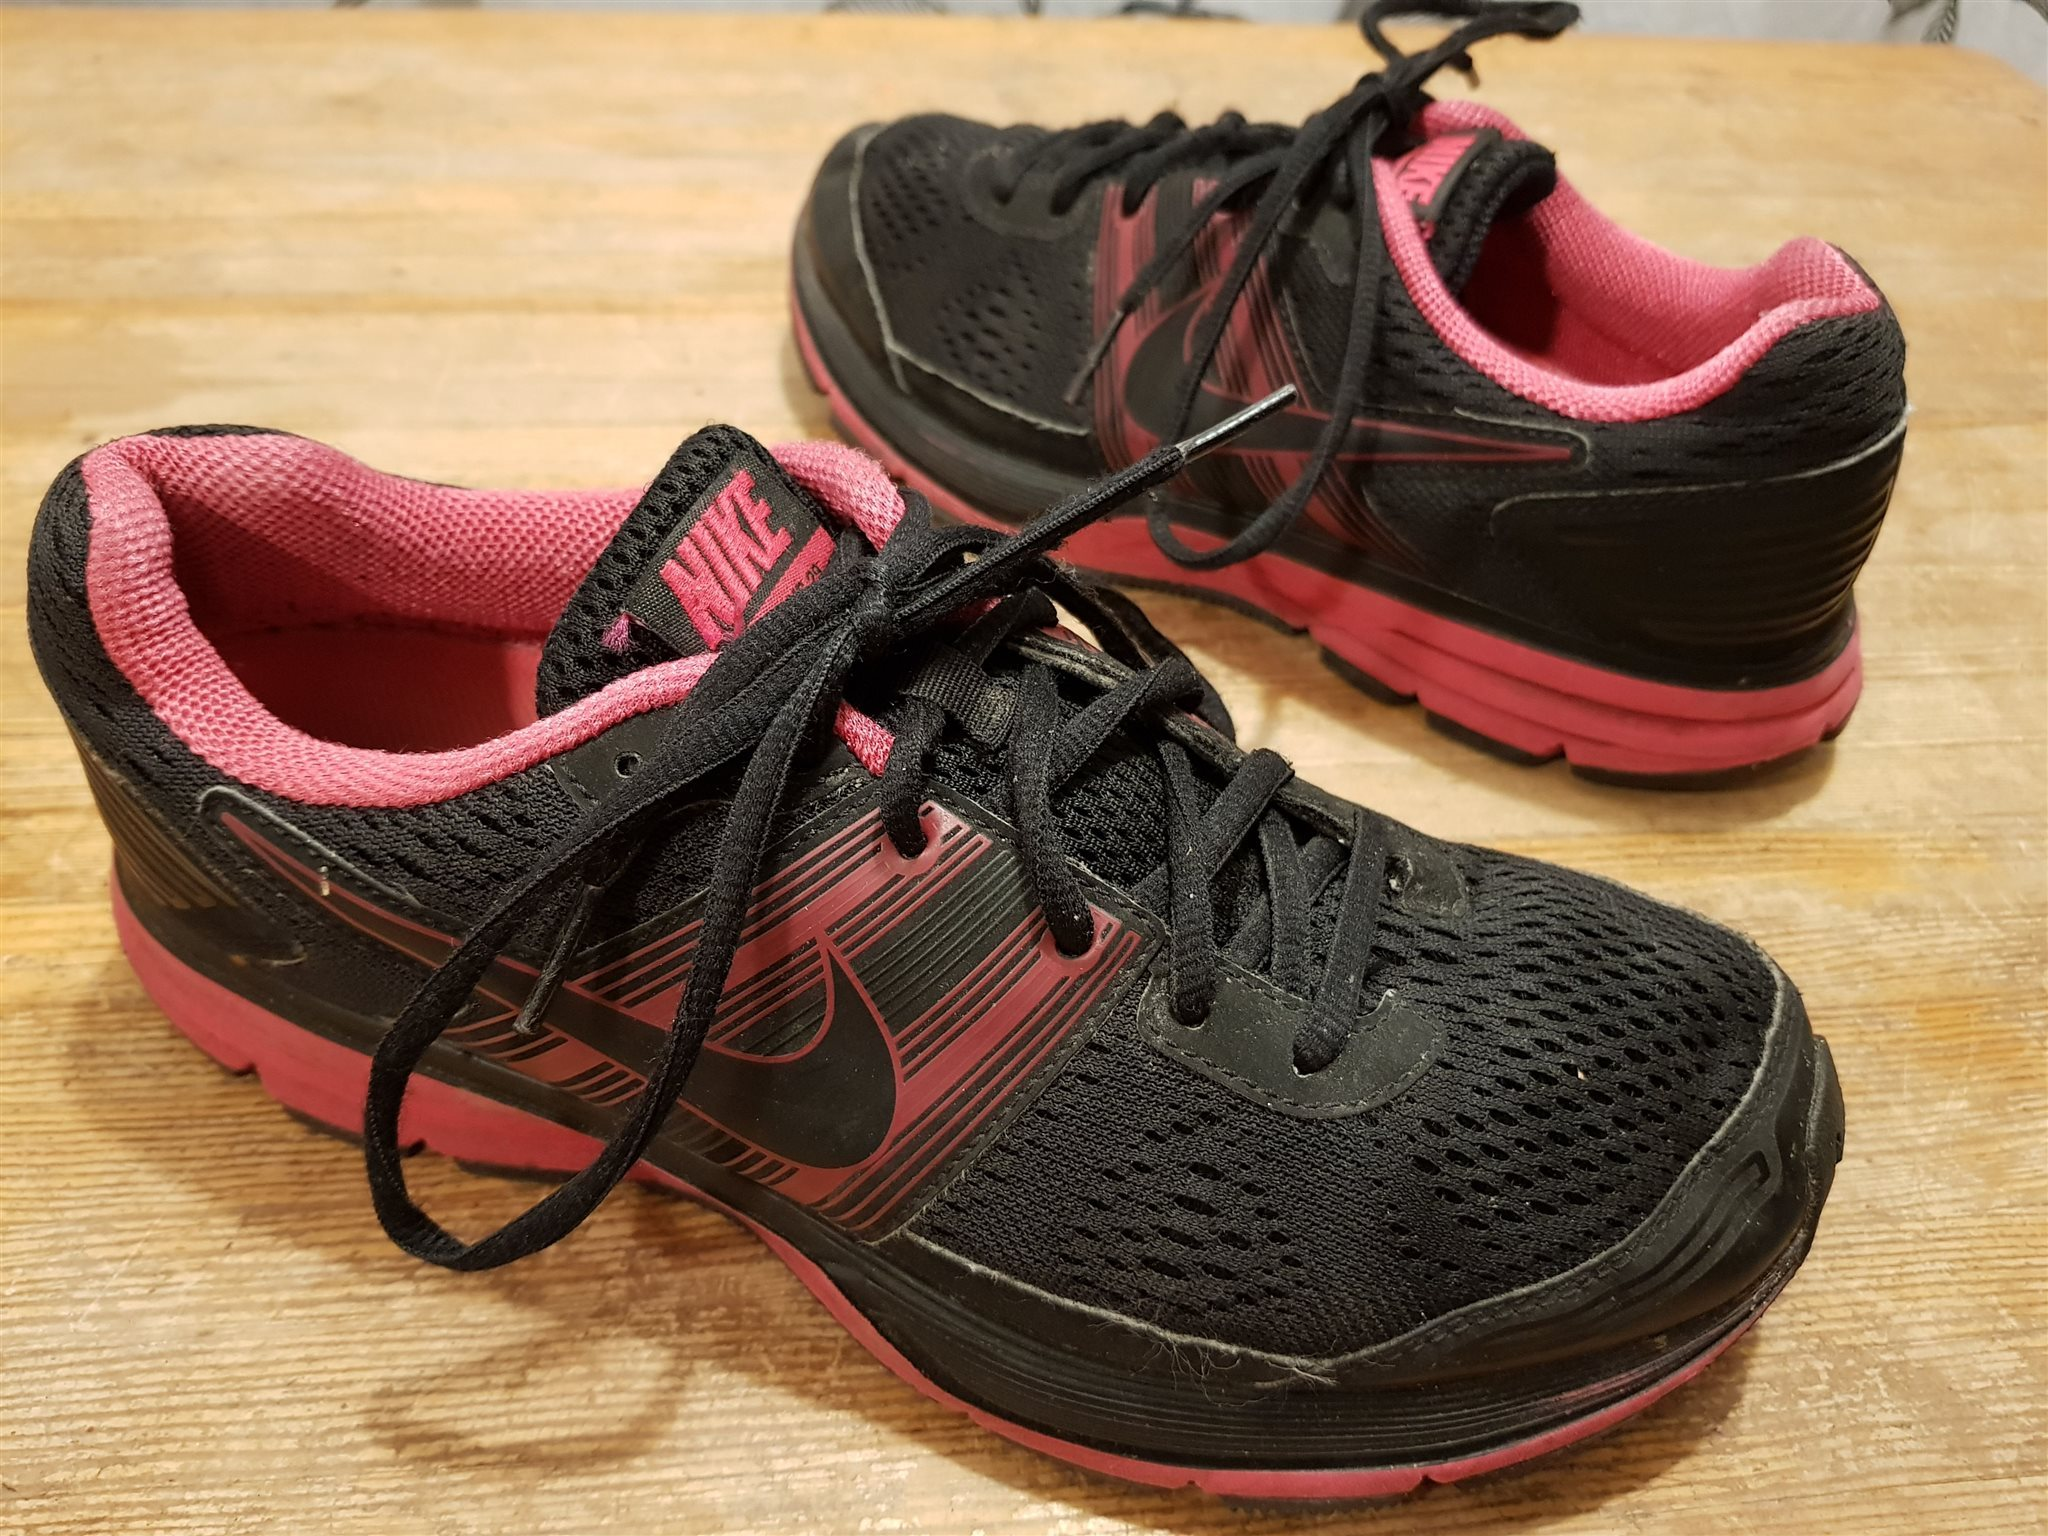 purchase cheap 06f34 7b0b1 Löparskor sportskor Nike Zoom Pegasus 29 Cushlon fritidsskor str 40 i fint  skick